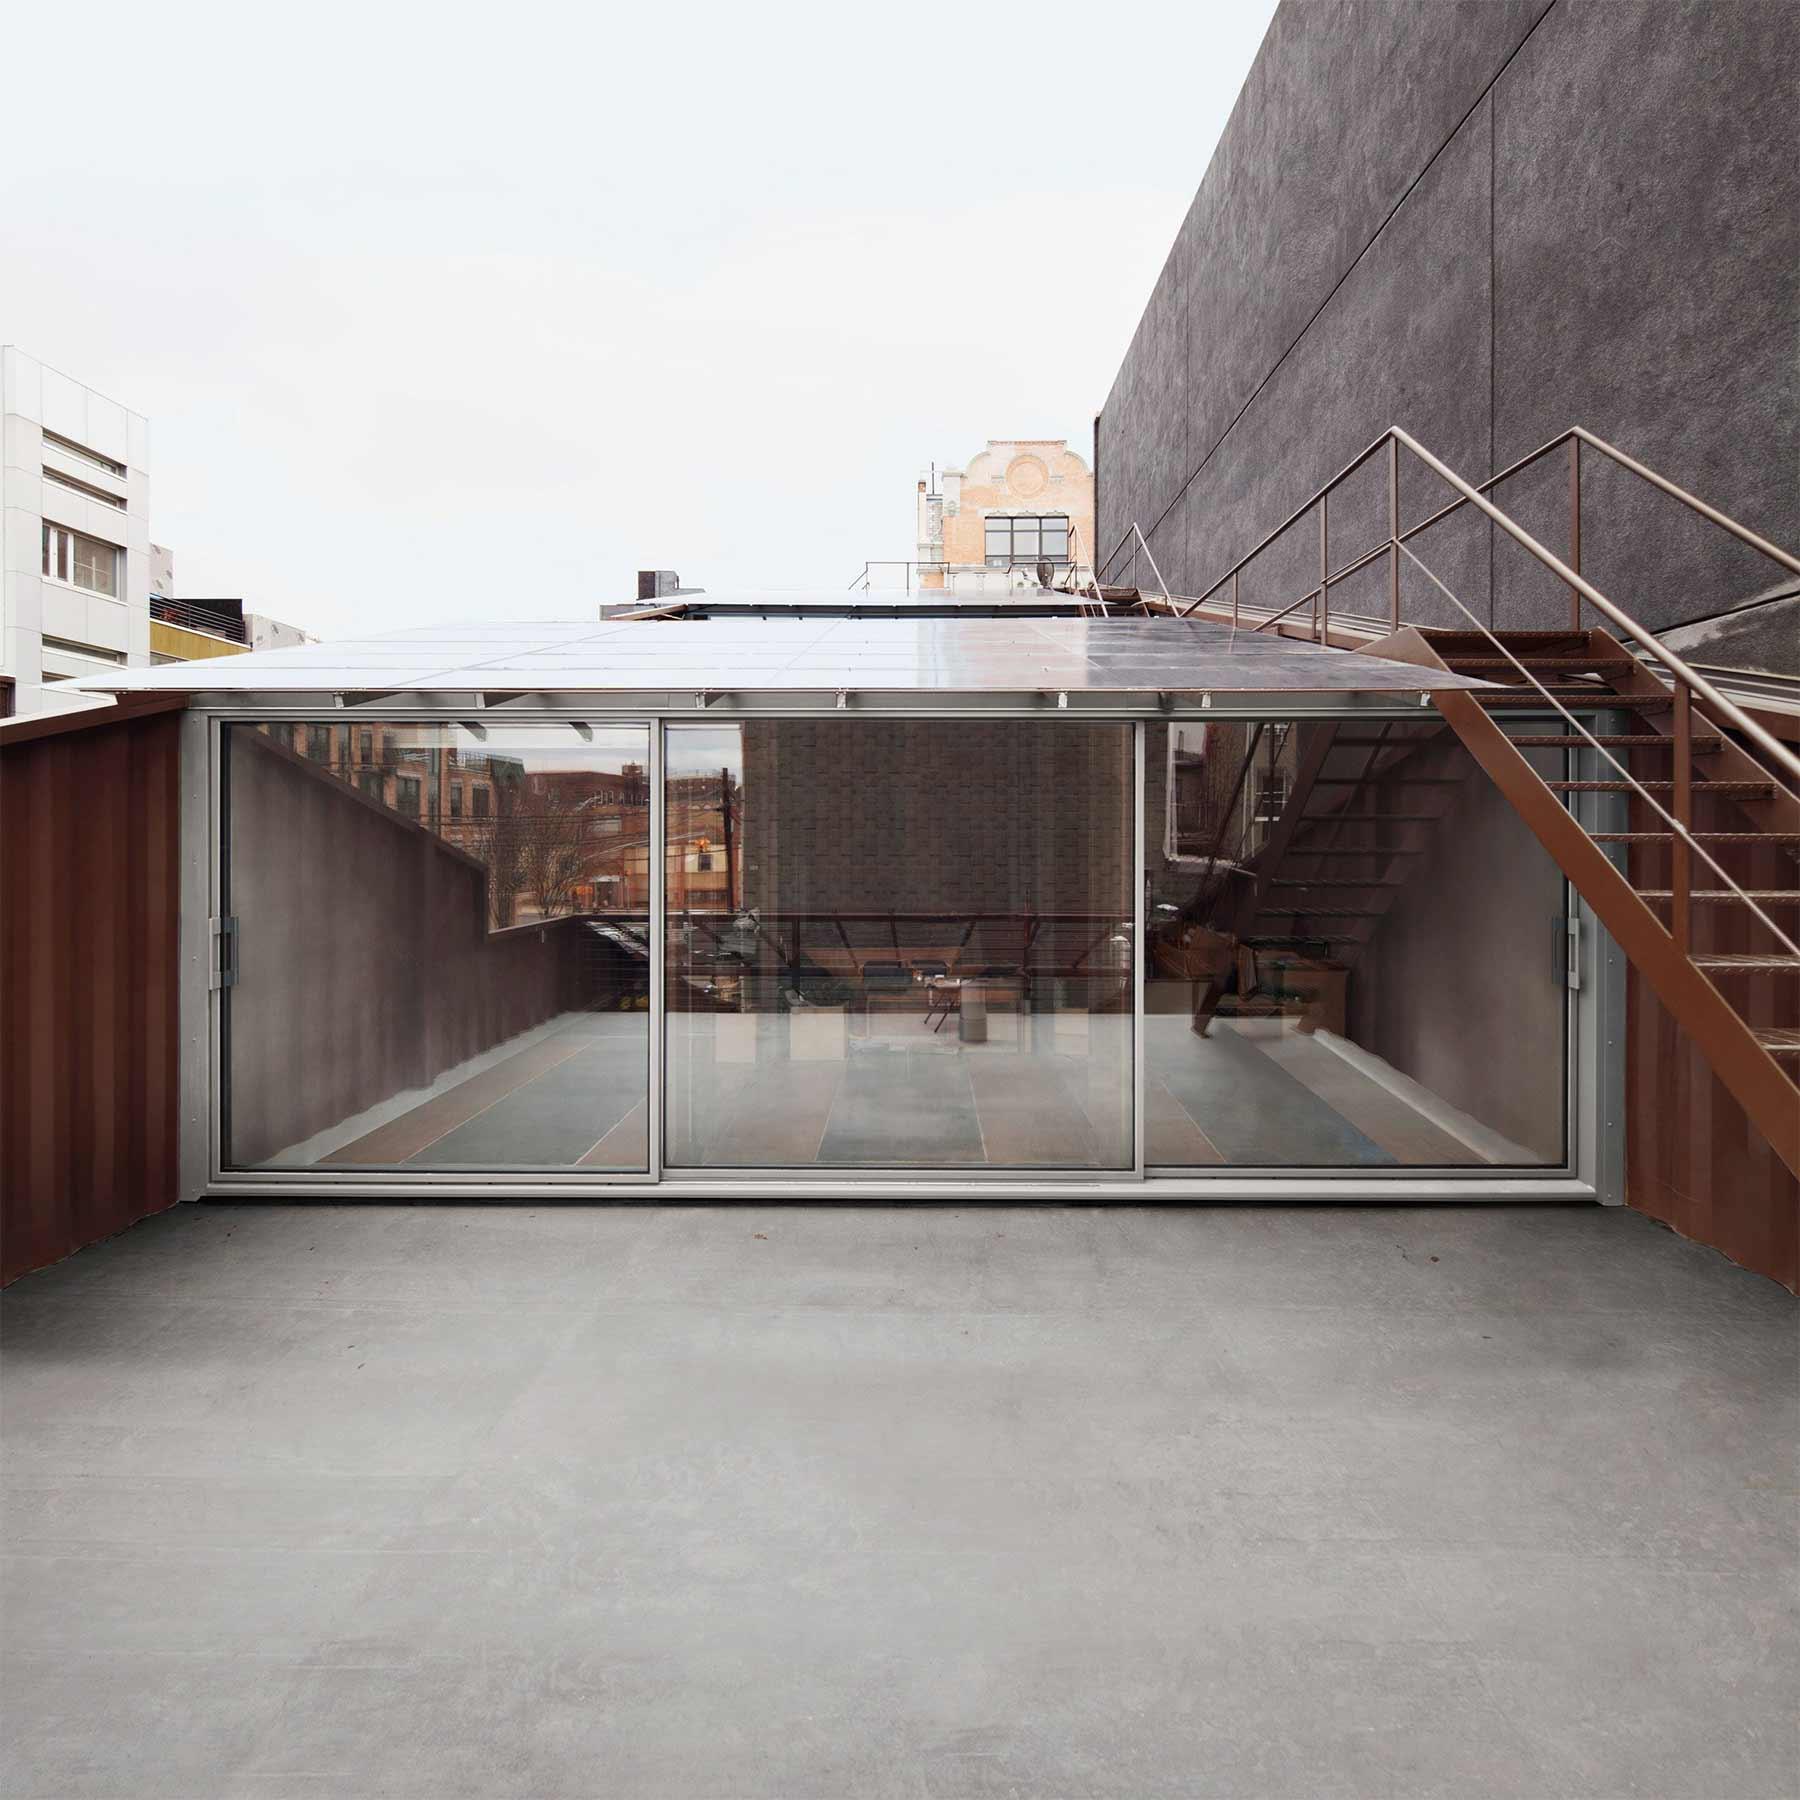 Haus aus 21 verschnittenen Containern carroll-house-21-Container_10